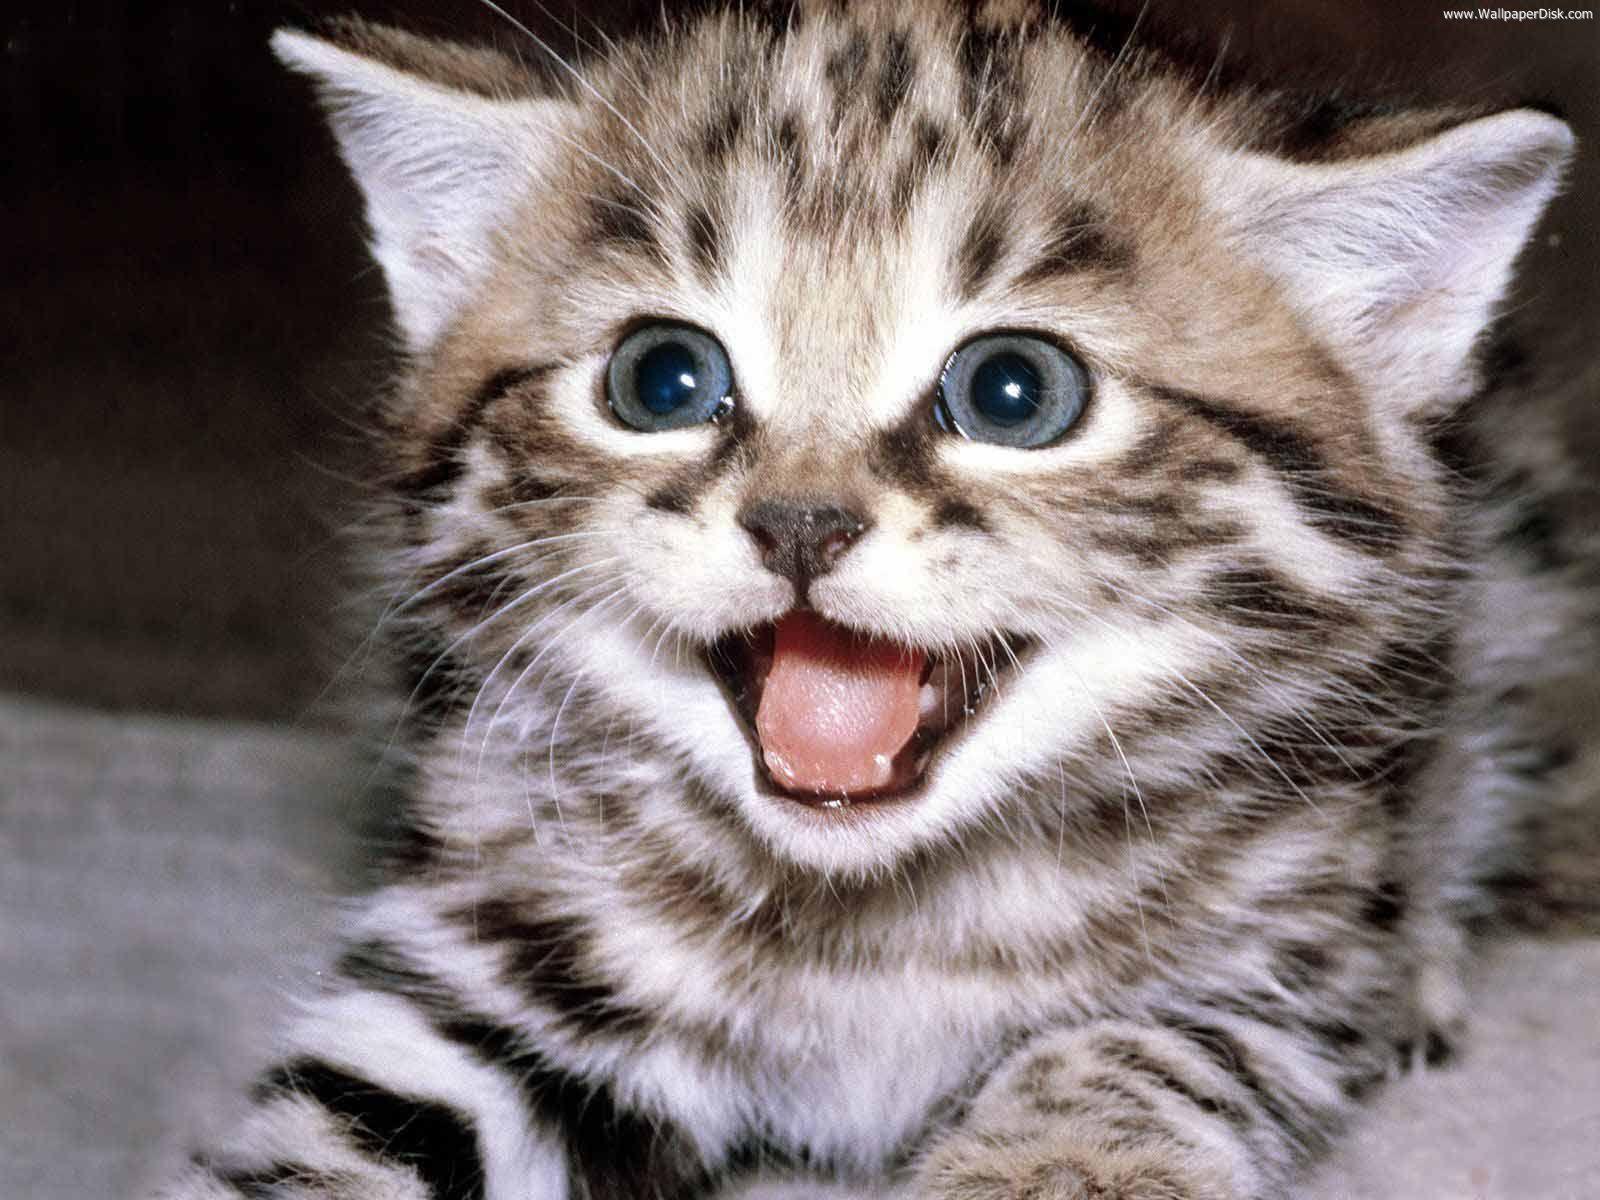 Http Www Wallpaperdisk Com Wallpapers Animals And Birds Smiling 20cat Jpg Kittens Cutest Funny Cat Wallpaper Happy Kitten